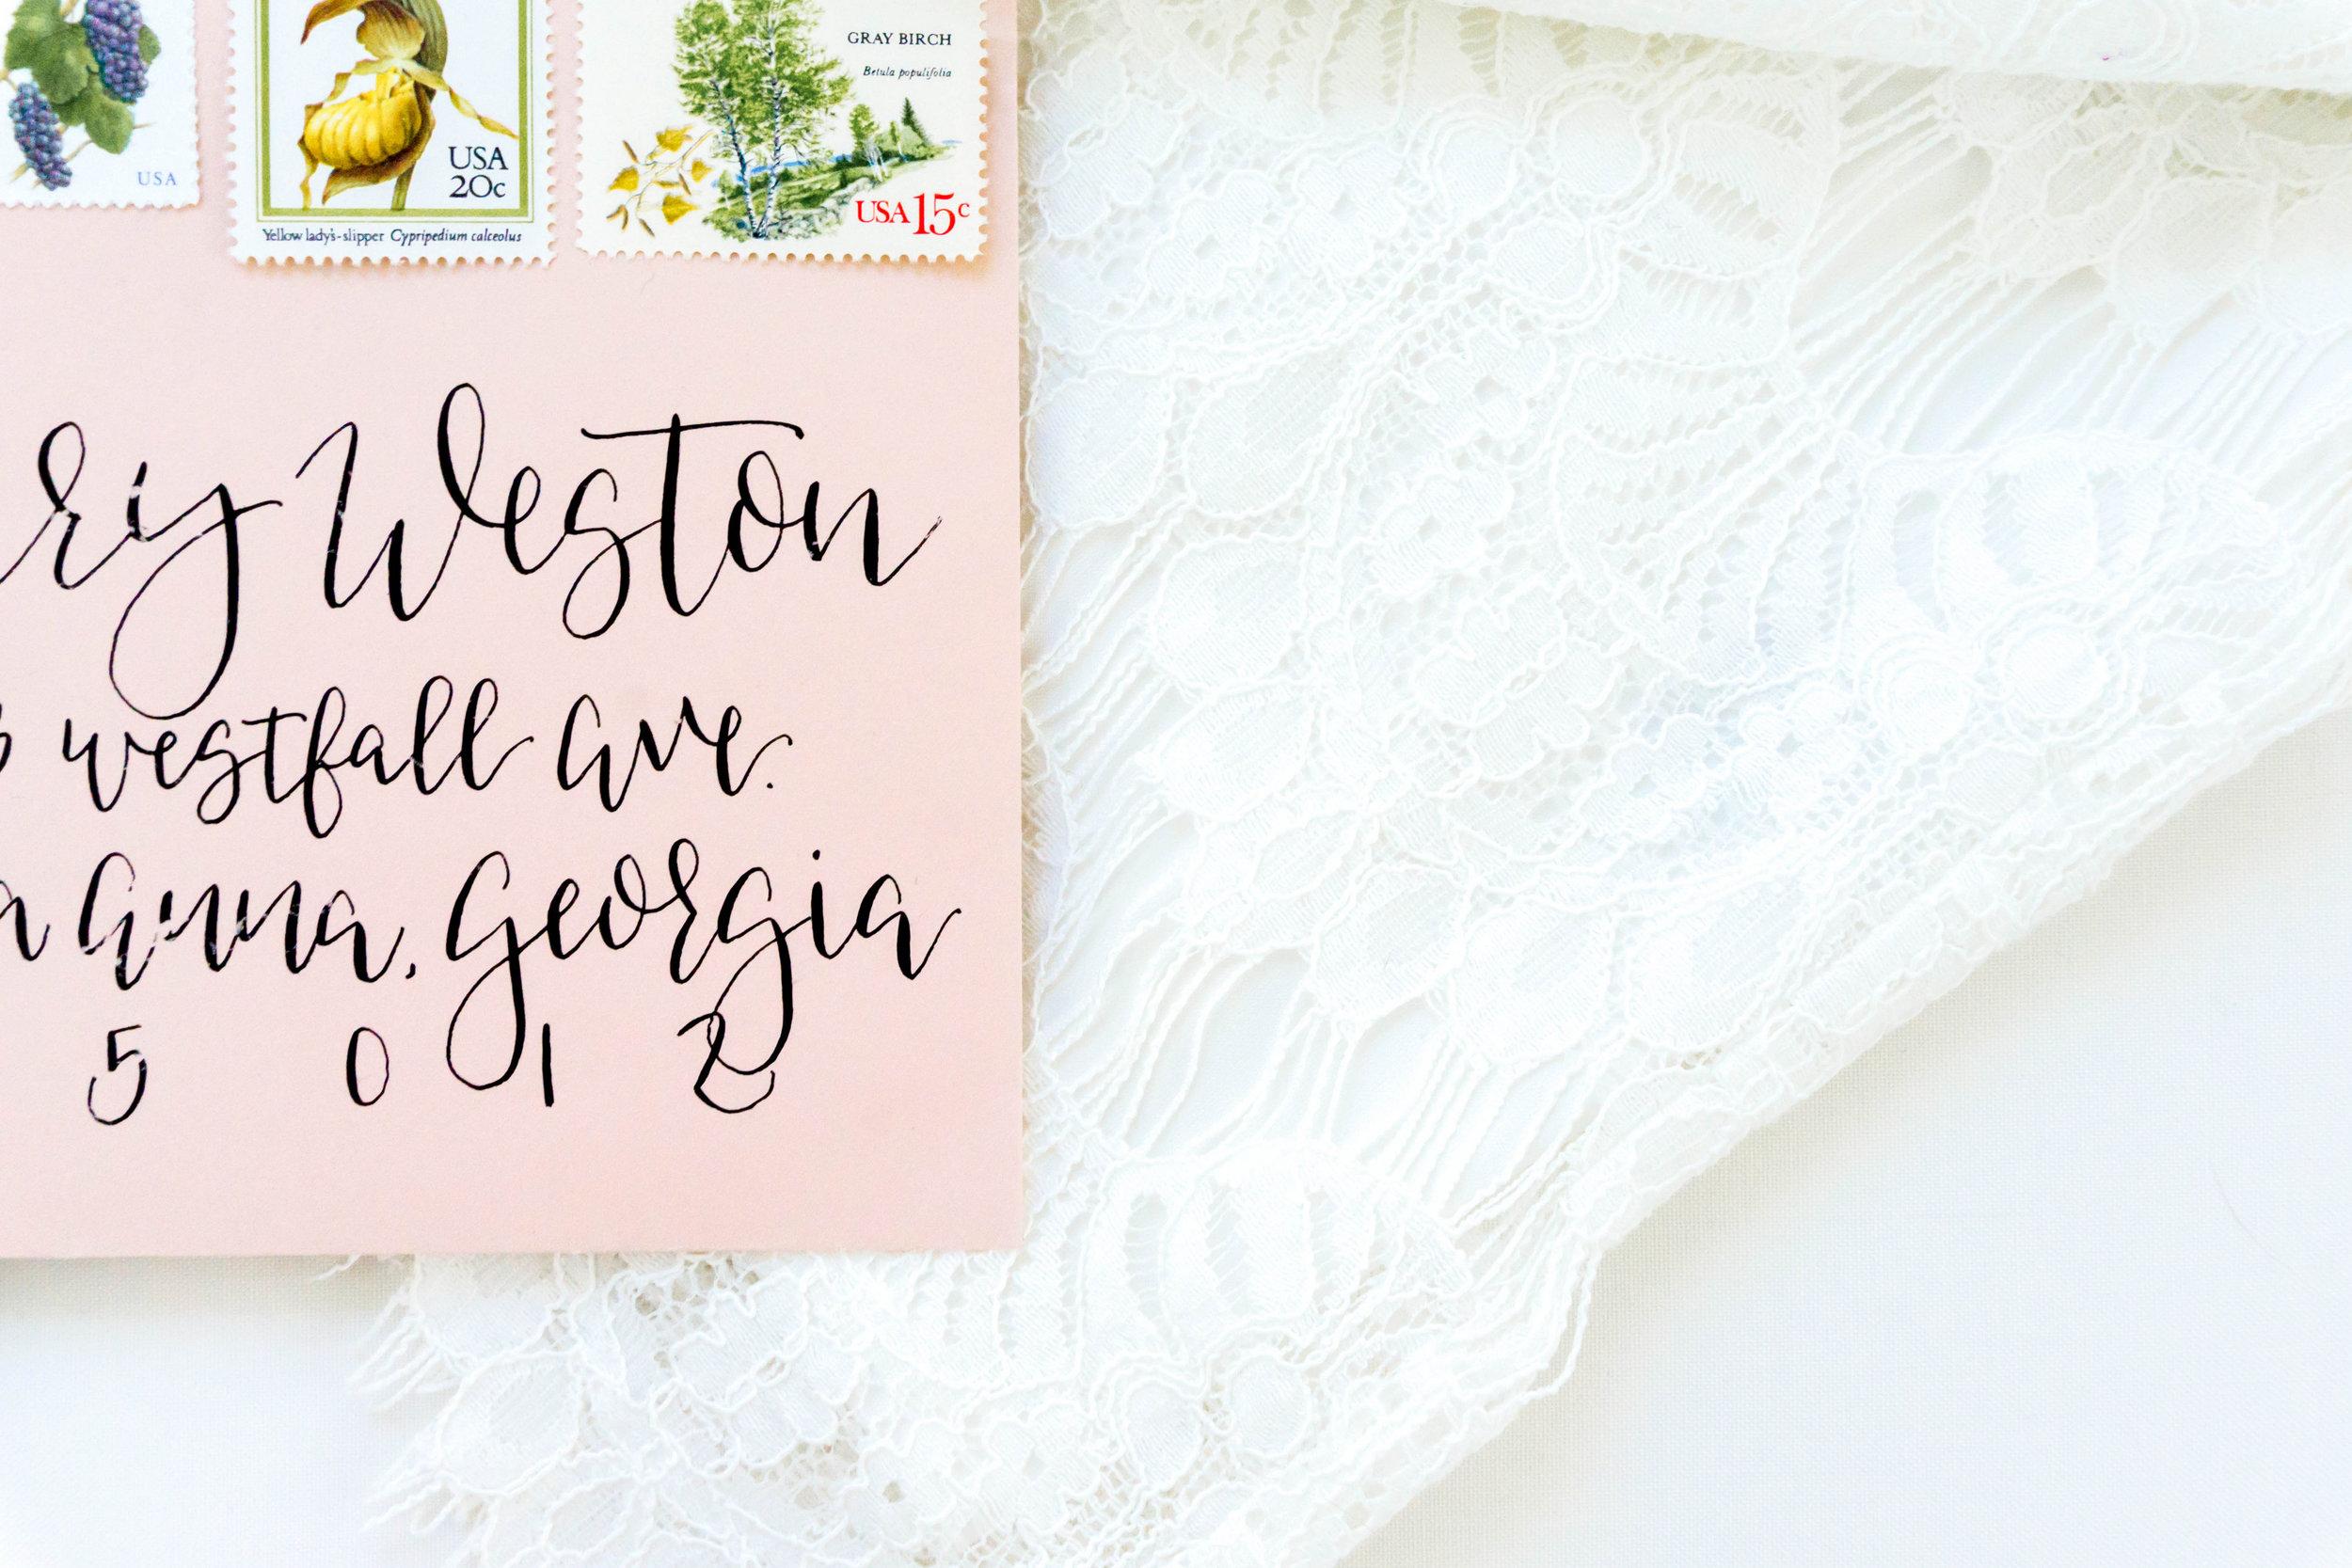 love-fern-design-studio-custom-wedding-invitations-for-the-modern-couple-modern-calligraphy-in-seattle-washington-custom-wedding-stationery-light-pink-watercolor-floral-invitation-pink-envelope